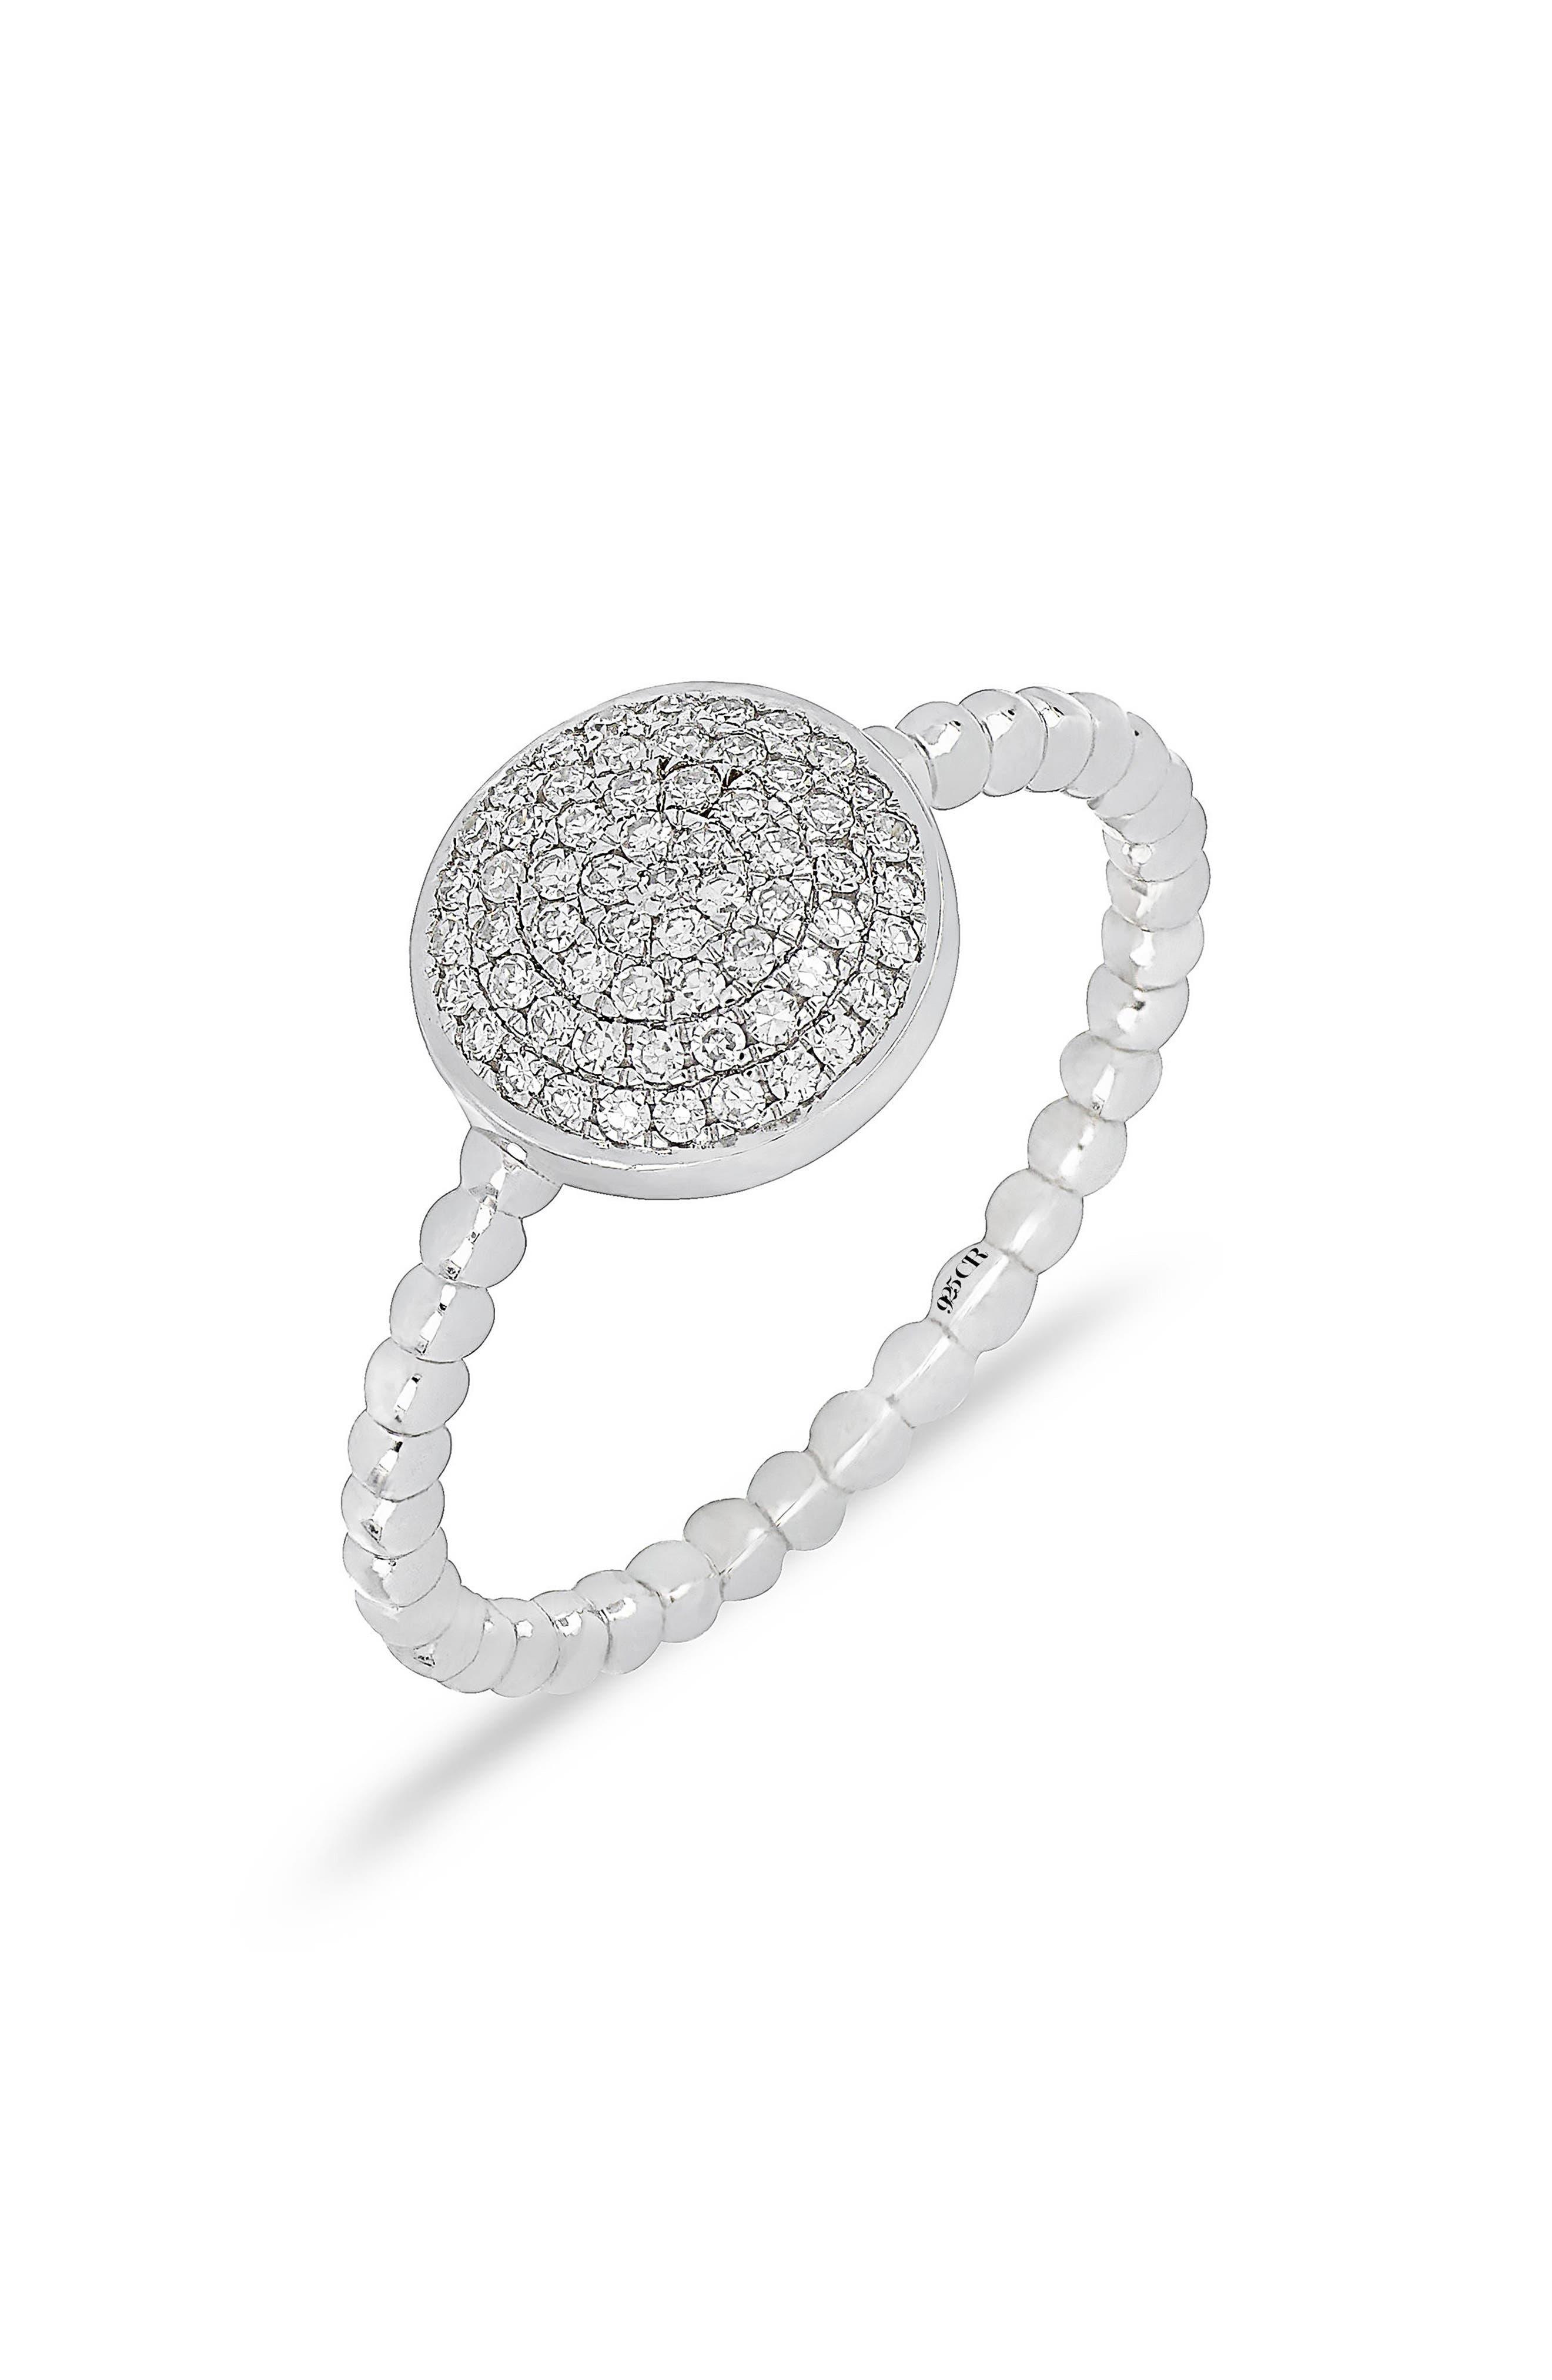 Carrière Pavé Diamond Disc Ring,                             Main thumbnail 1, color,